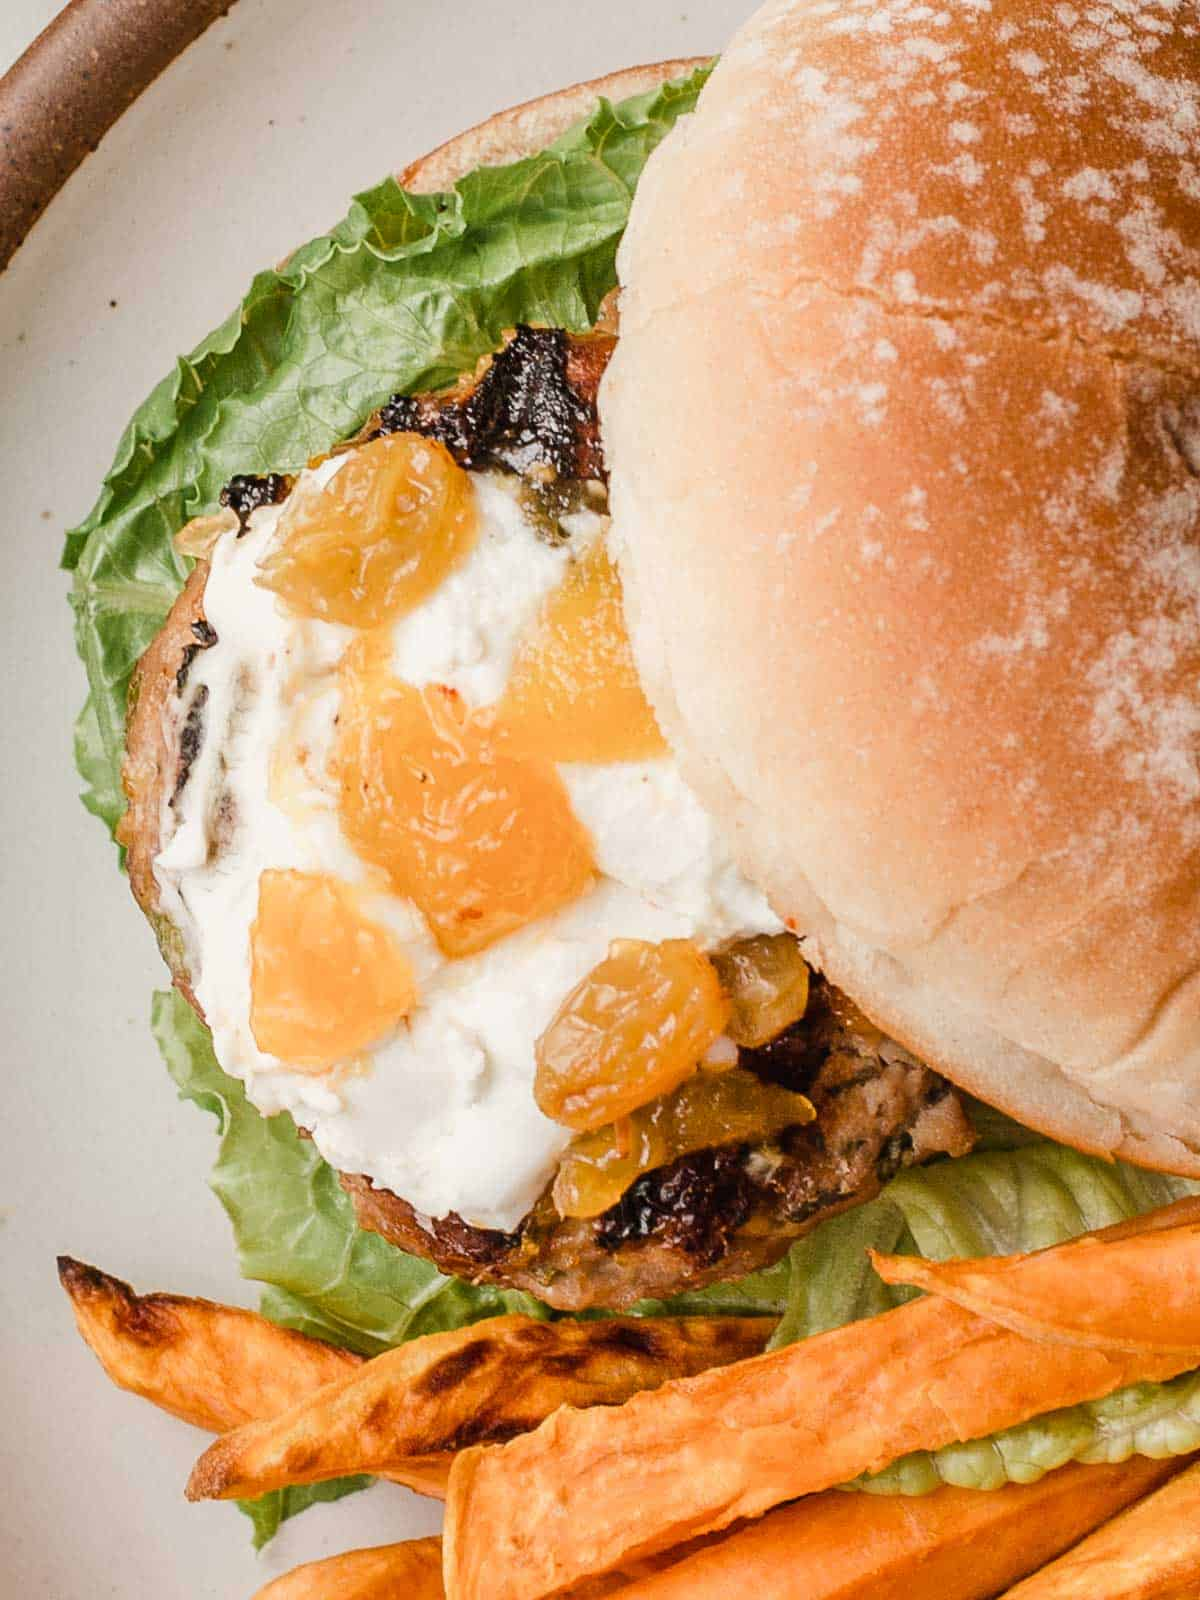 An overhead photo of a turkey burger on a plate.